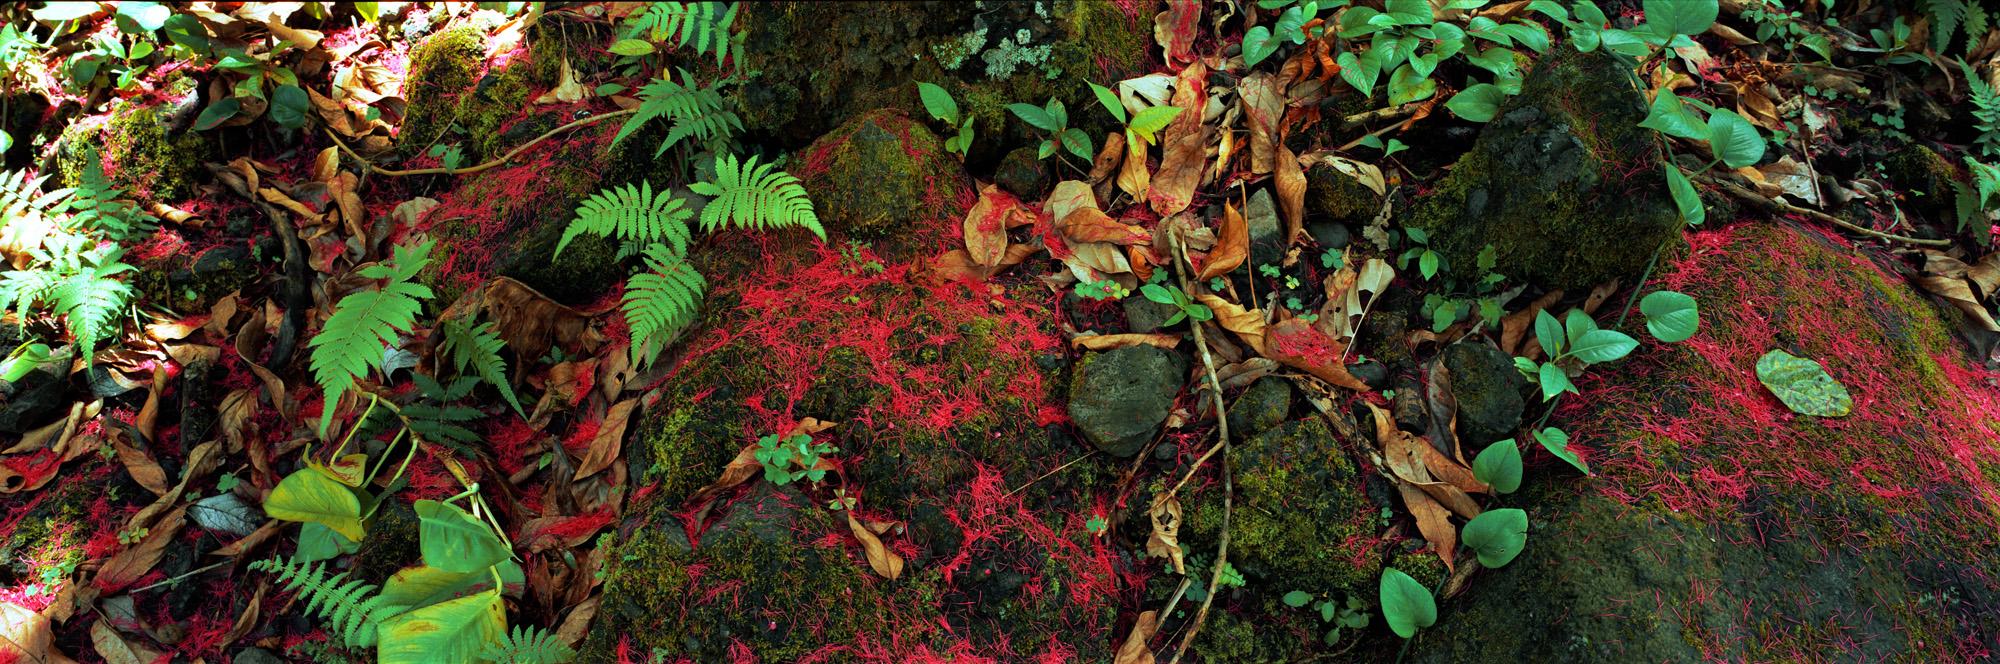 Brachland, Landschaft, Natur, analoge Fotografie, Großformat, Panoramafotografie, Markus Bollen, 6x17, grün, Leben, Wachstum, Frieden, Ruhe, Maui, Waldboden, Hawaii